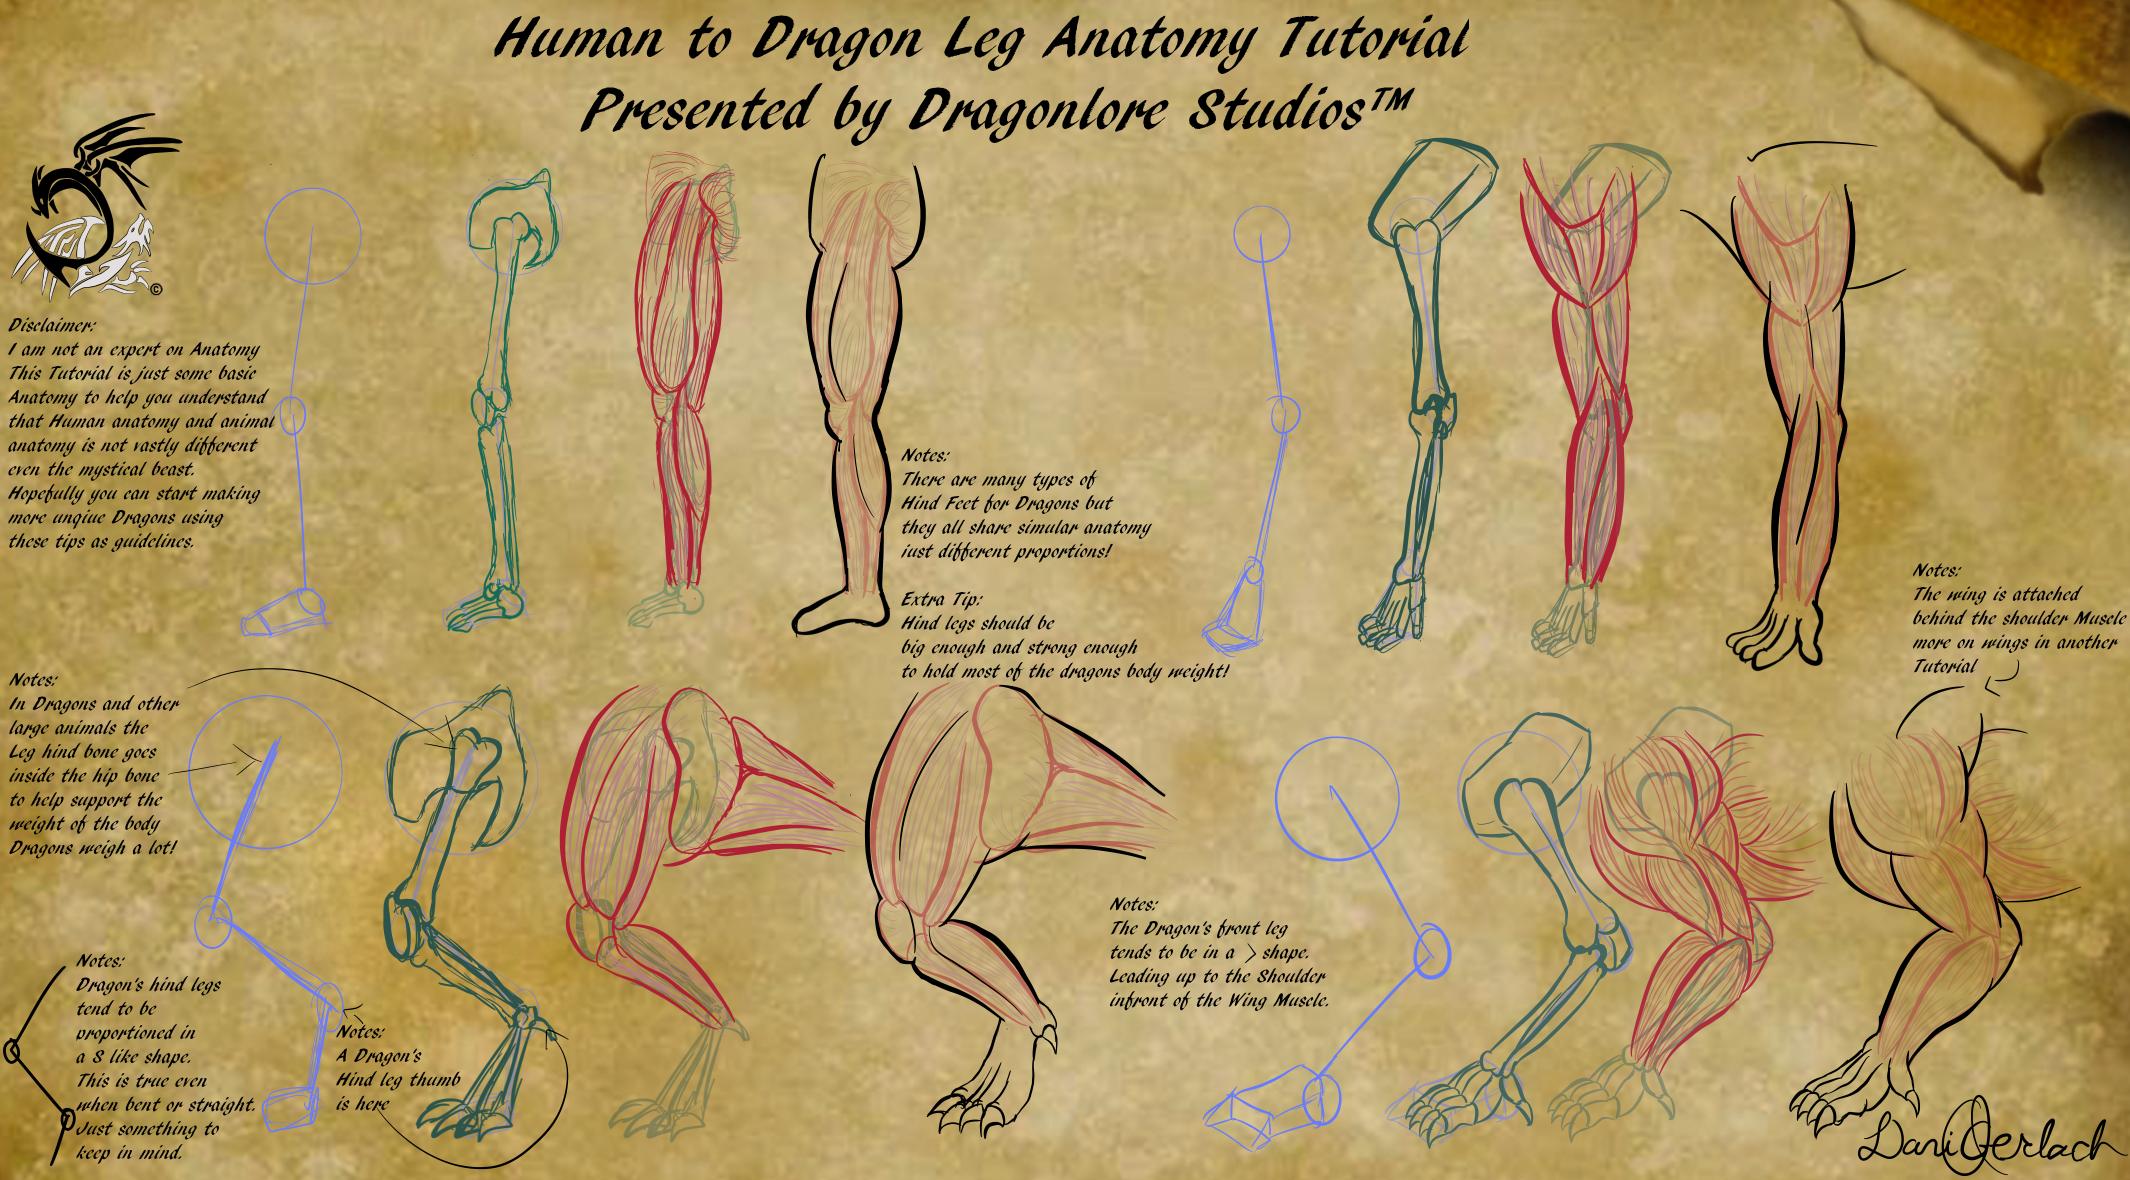 Human To Dragon Leg Anatomy Tutorial By Dragonlorestudios On Deviantart